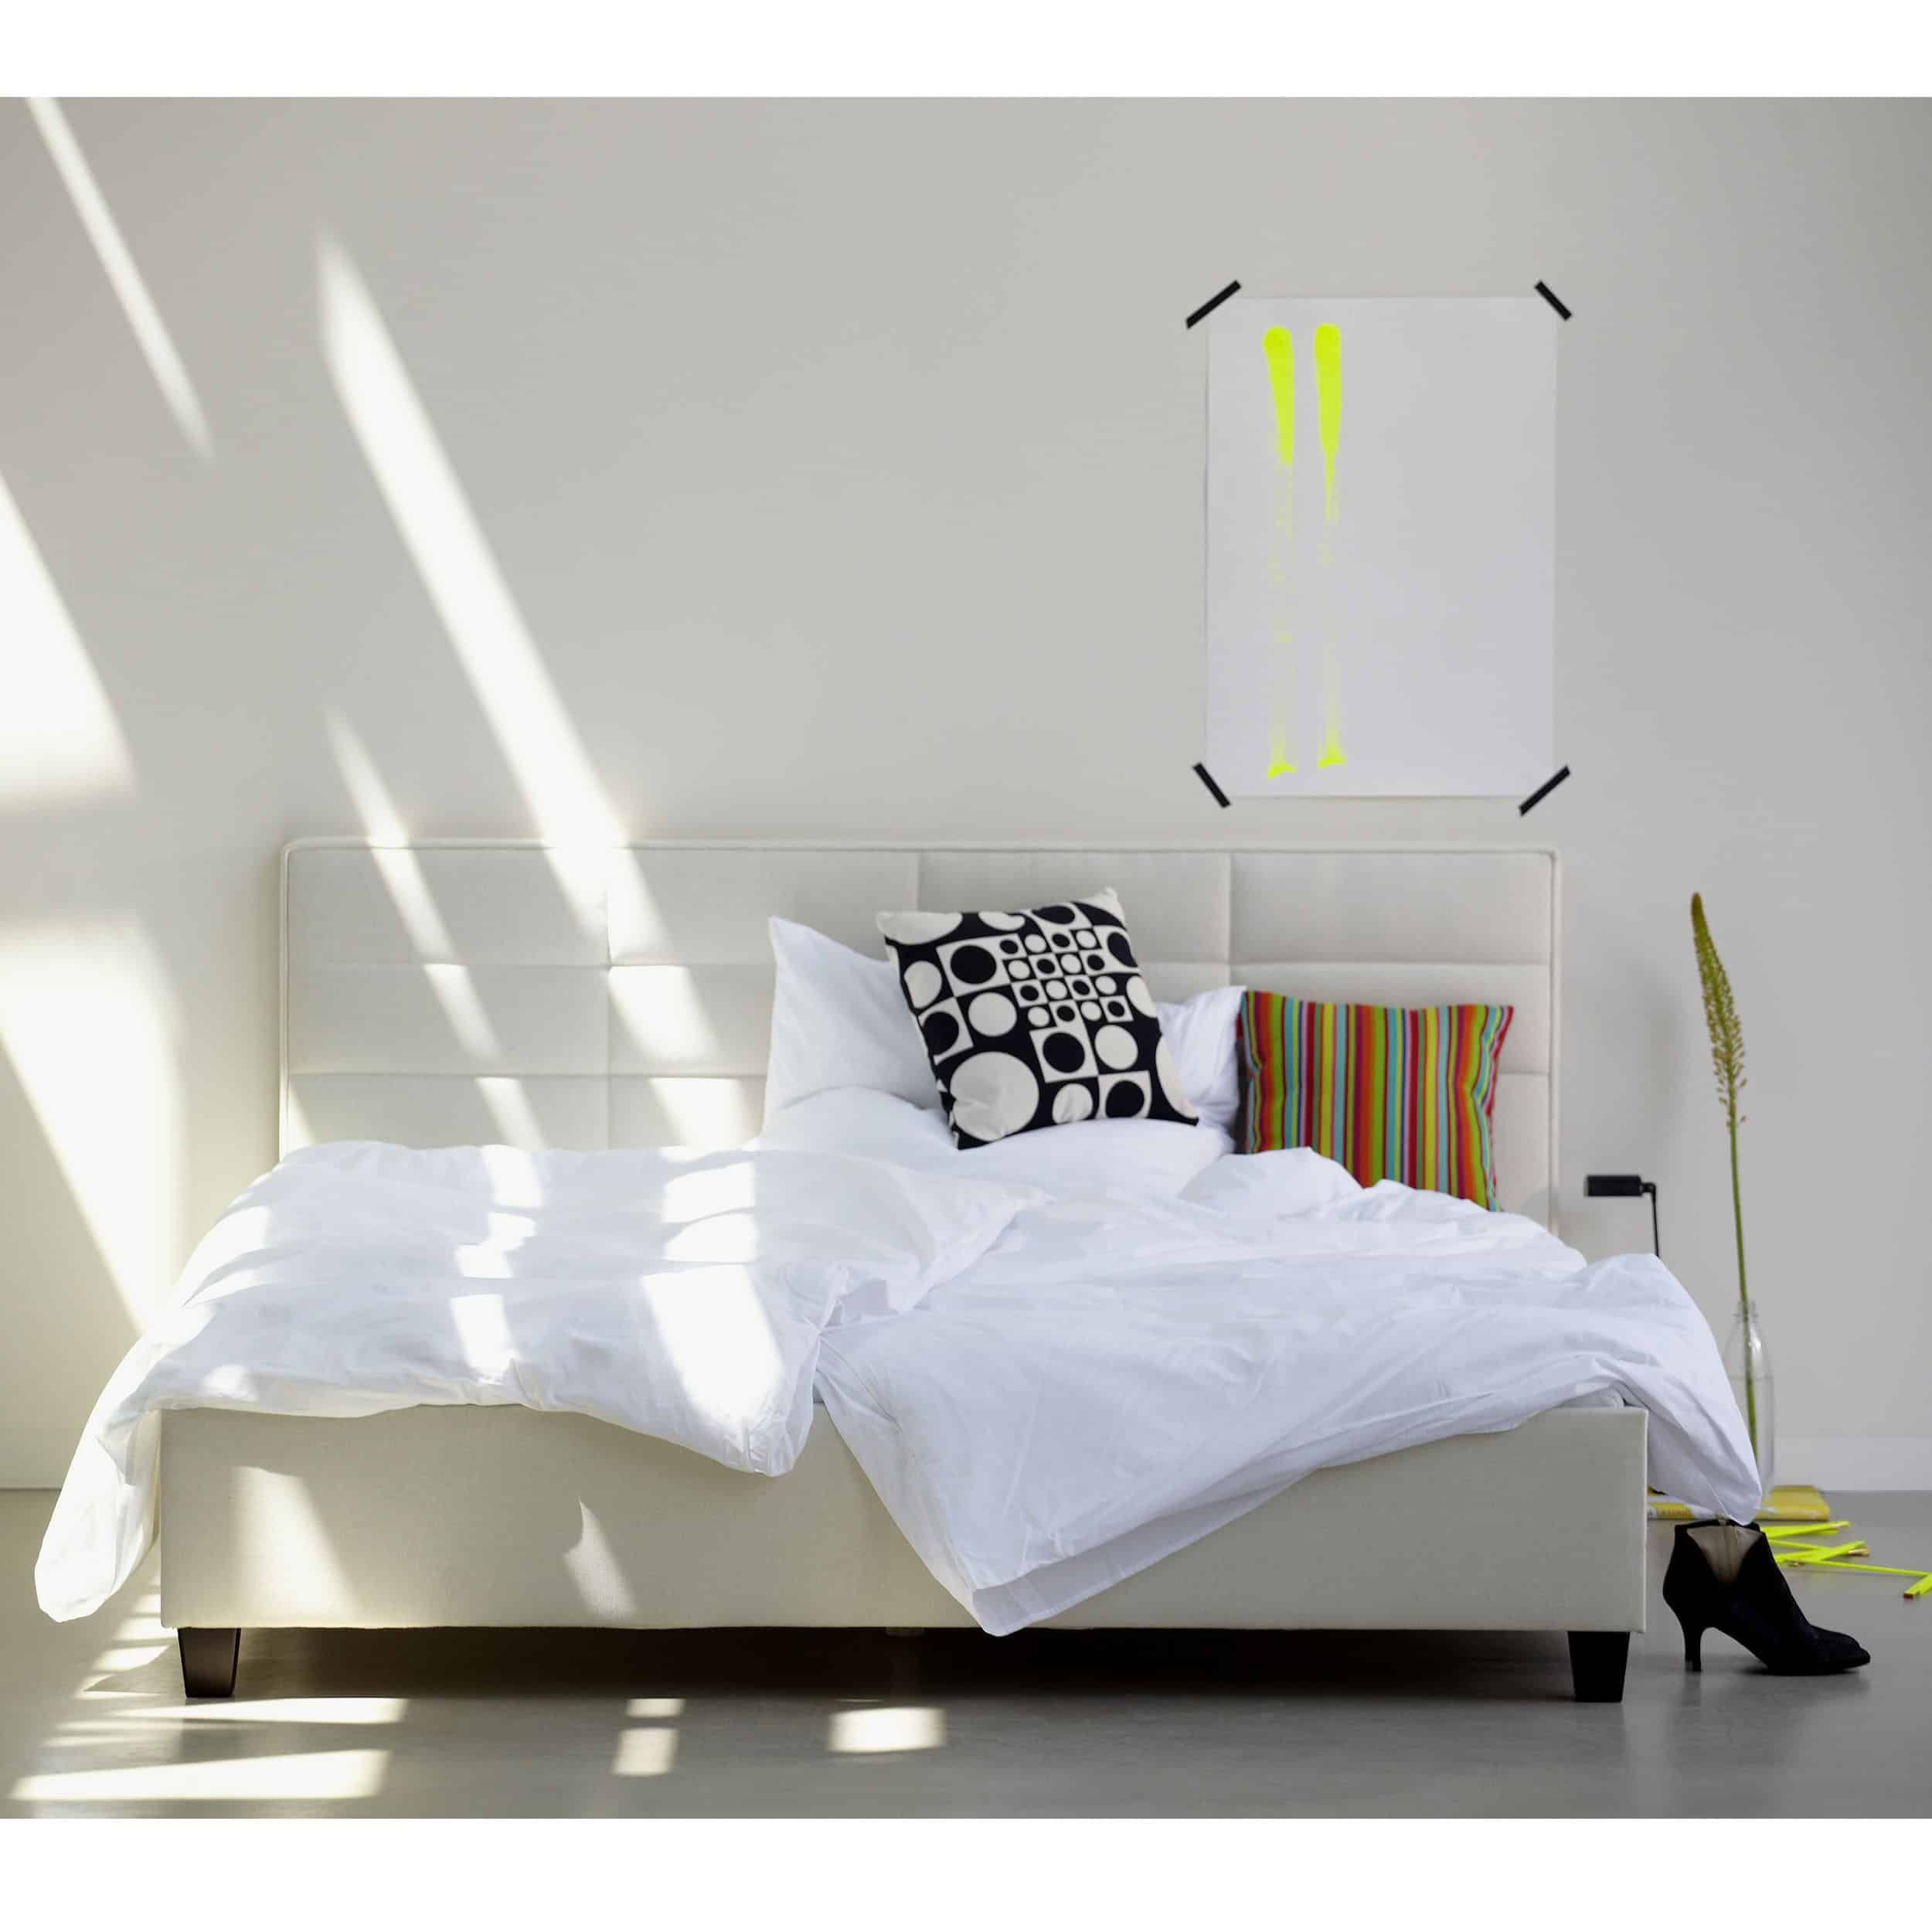 tosno polsterbett betten pinterest bett schlafzimmer und polsterbett. Black Bedroom Furniture Sets. Home Design Ideas